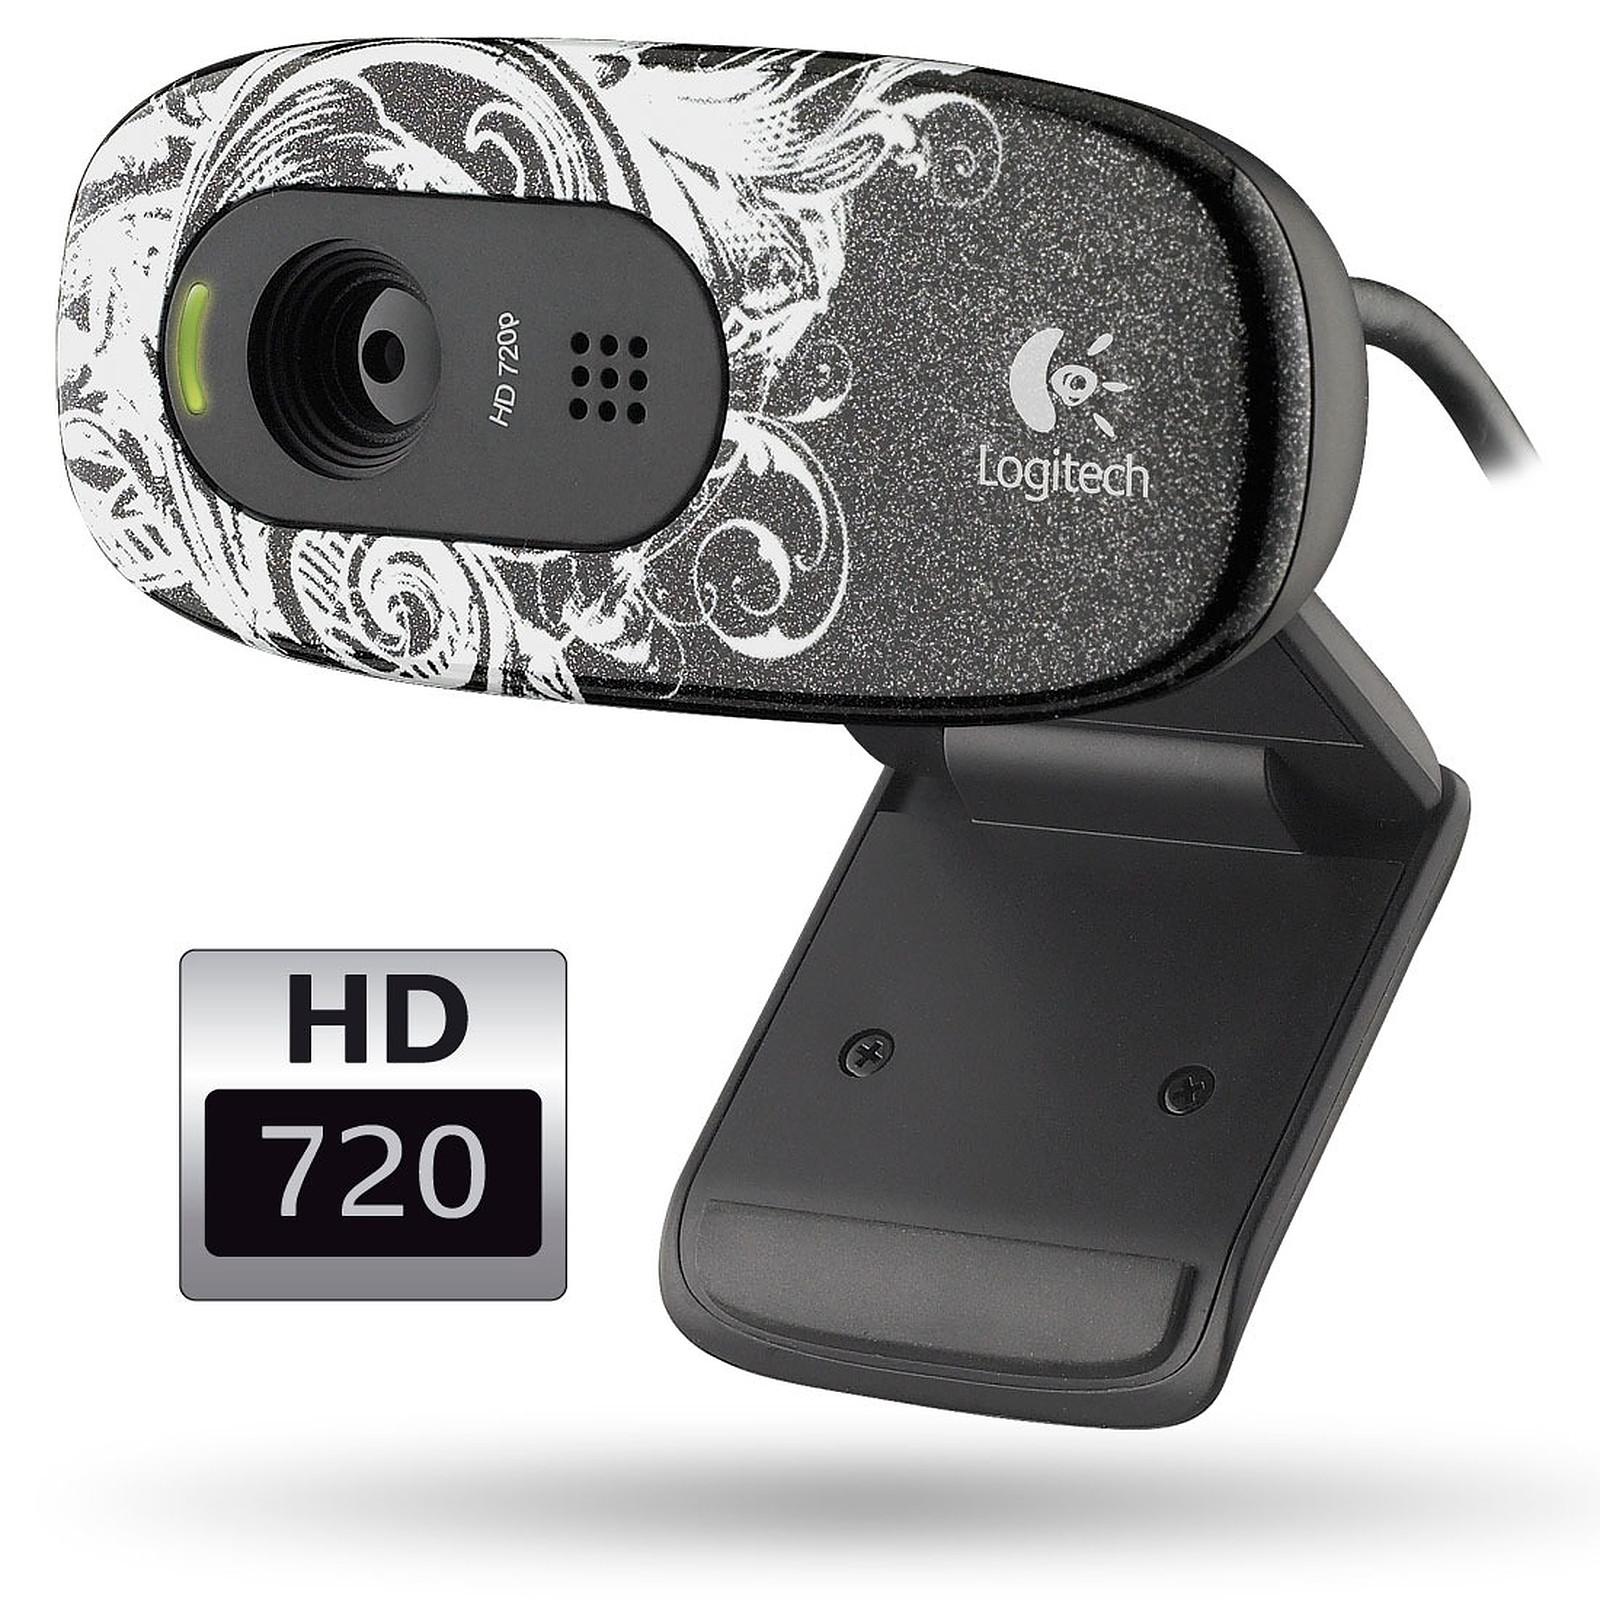 Logitech HD Webcam C270 - Fleur Dark